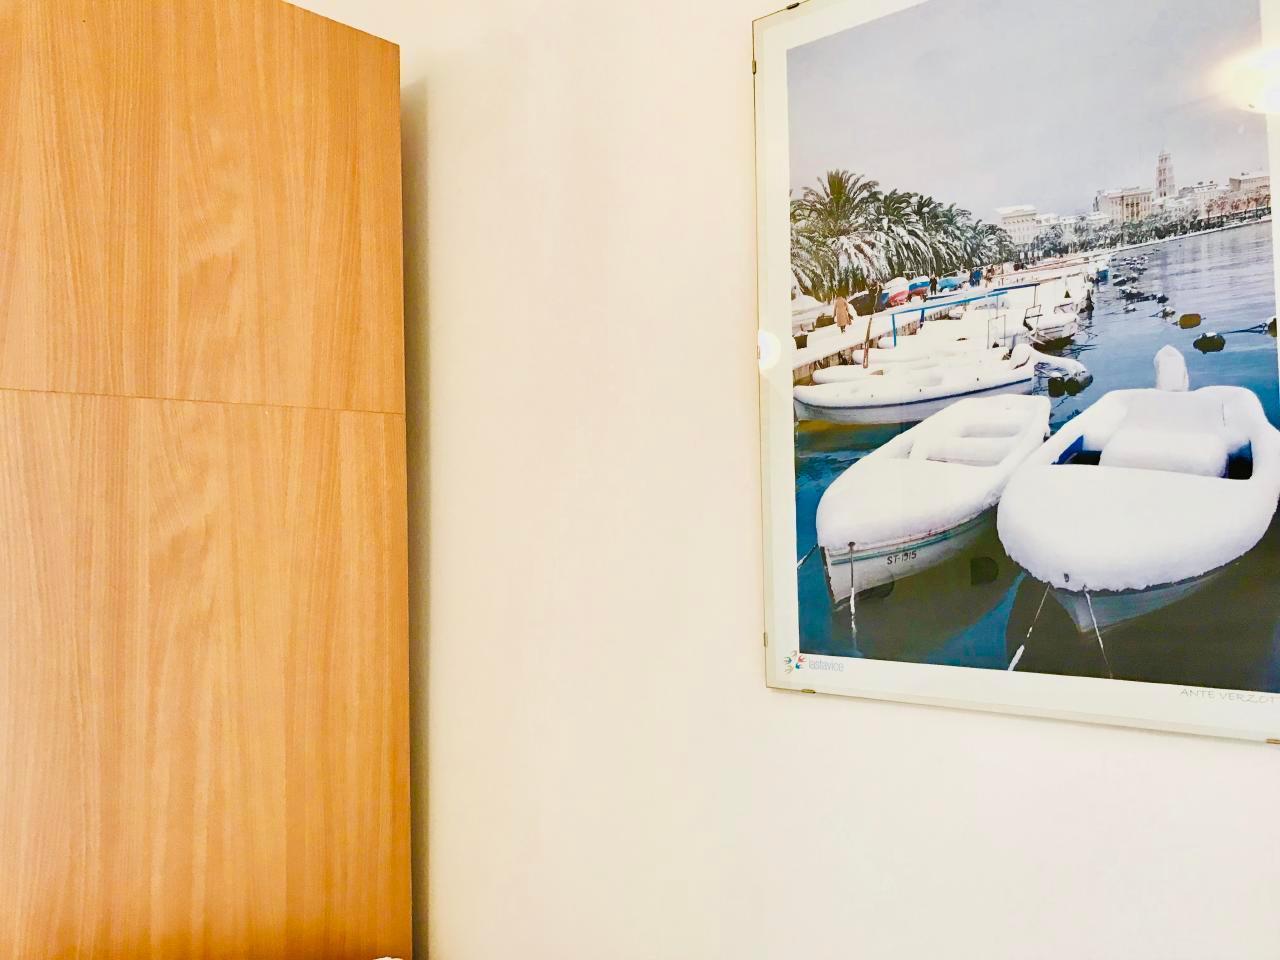 Ferienwohnung Apartmenthaus Ruza 6 - Apartment (98382), Kaštel Štafilić, , Dalmatien, Kroatien, Bild 10